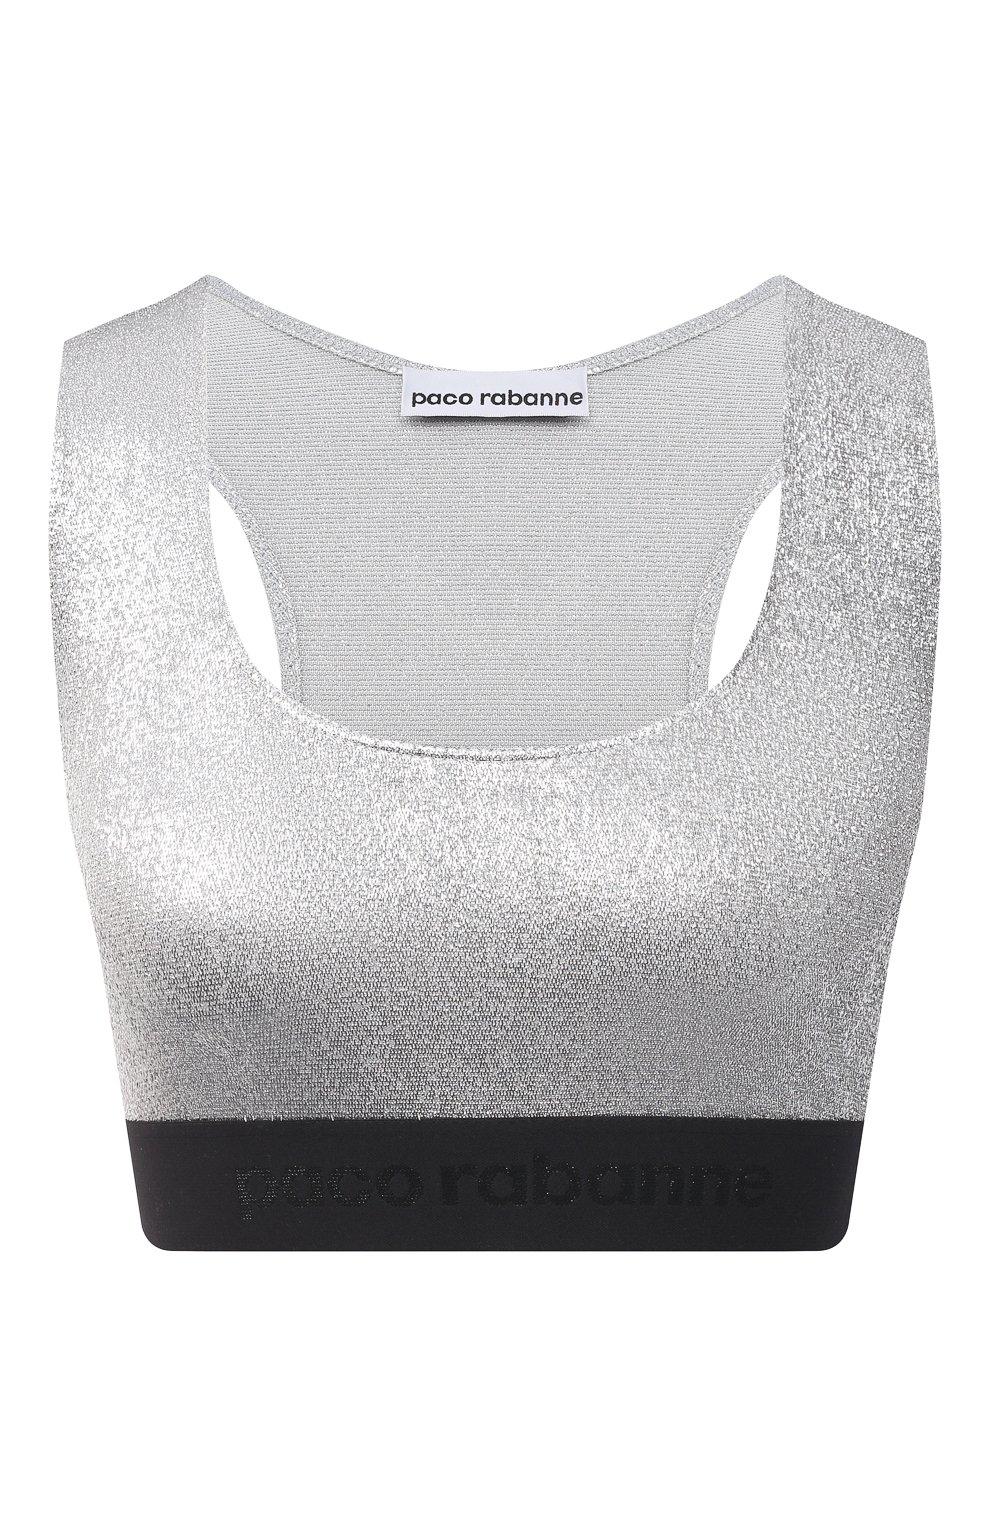 Женский бра-топ из вискозы PACO RABANNE серебряного цвета, арт. 20PJT0001VI0222 | Фото 1